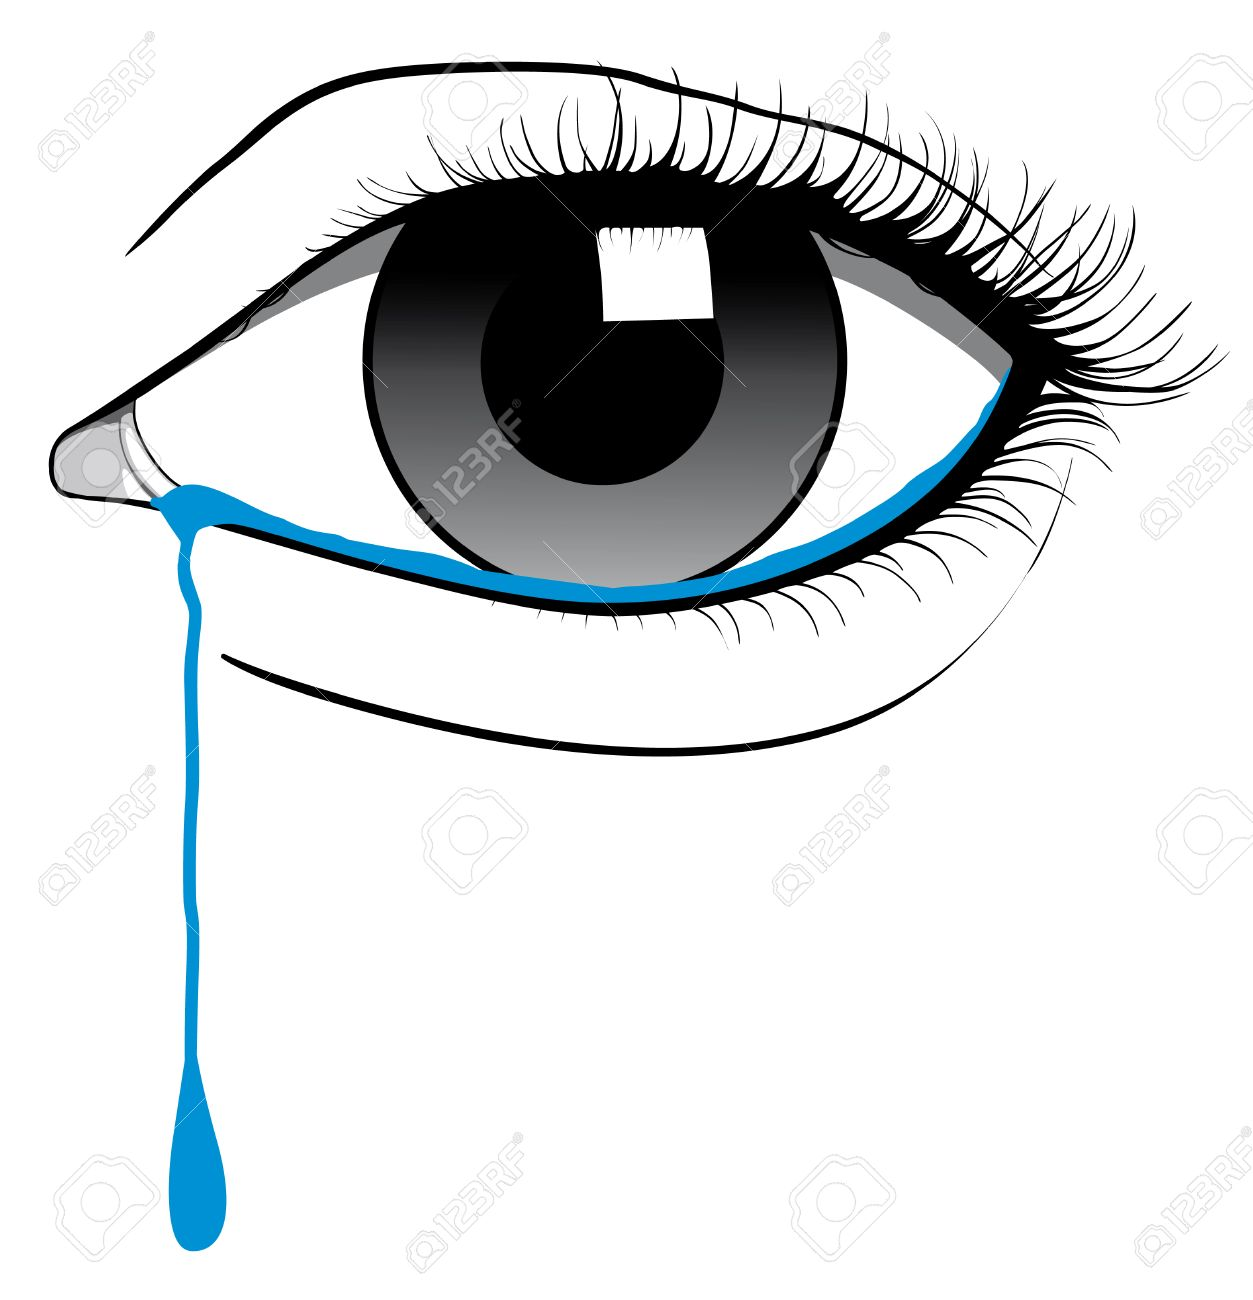 crying eye royalty free cliparts vectors and stock illustration rh 123rf com